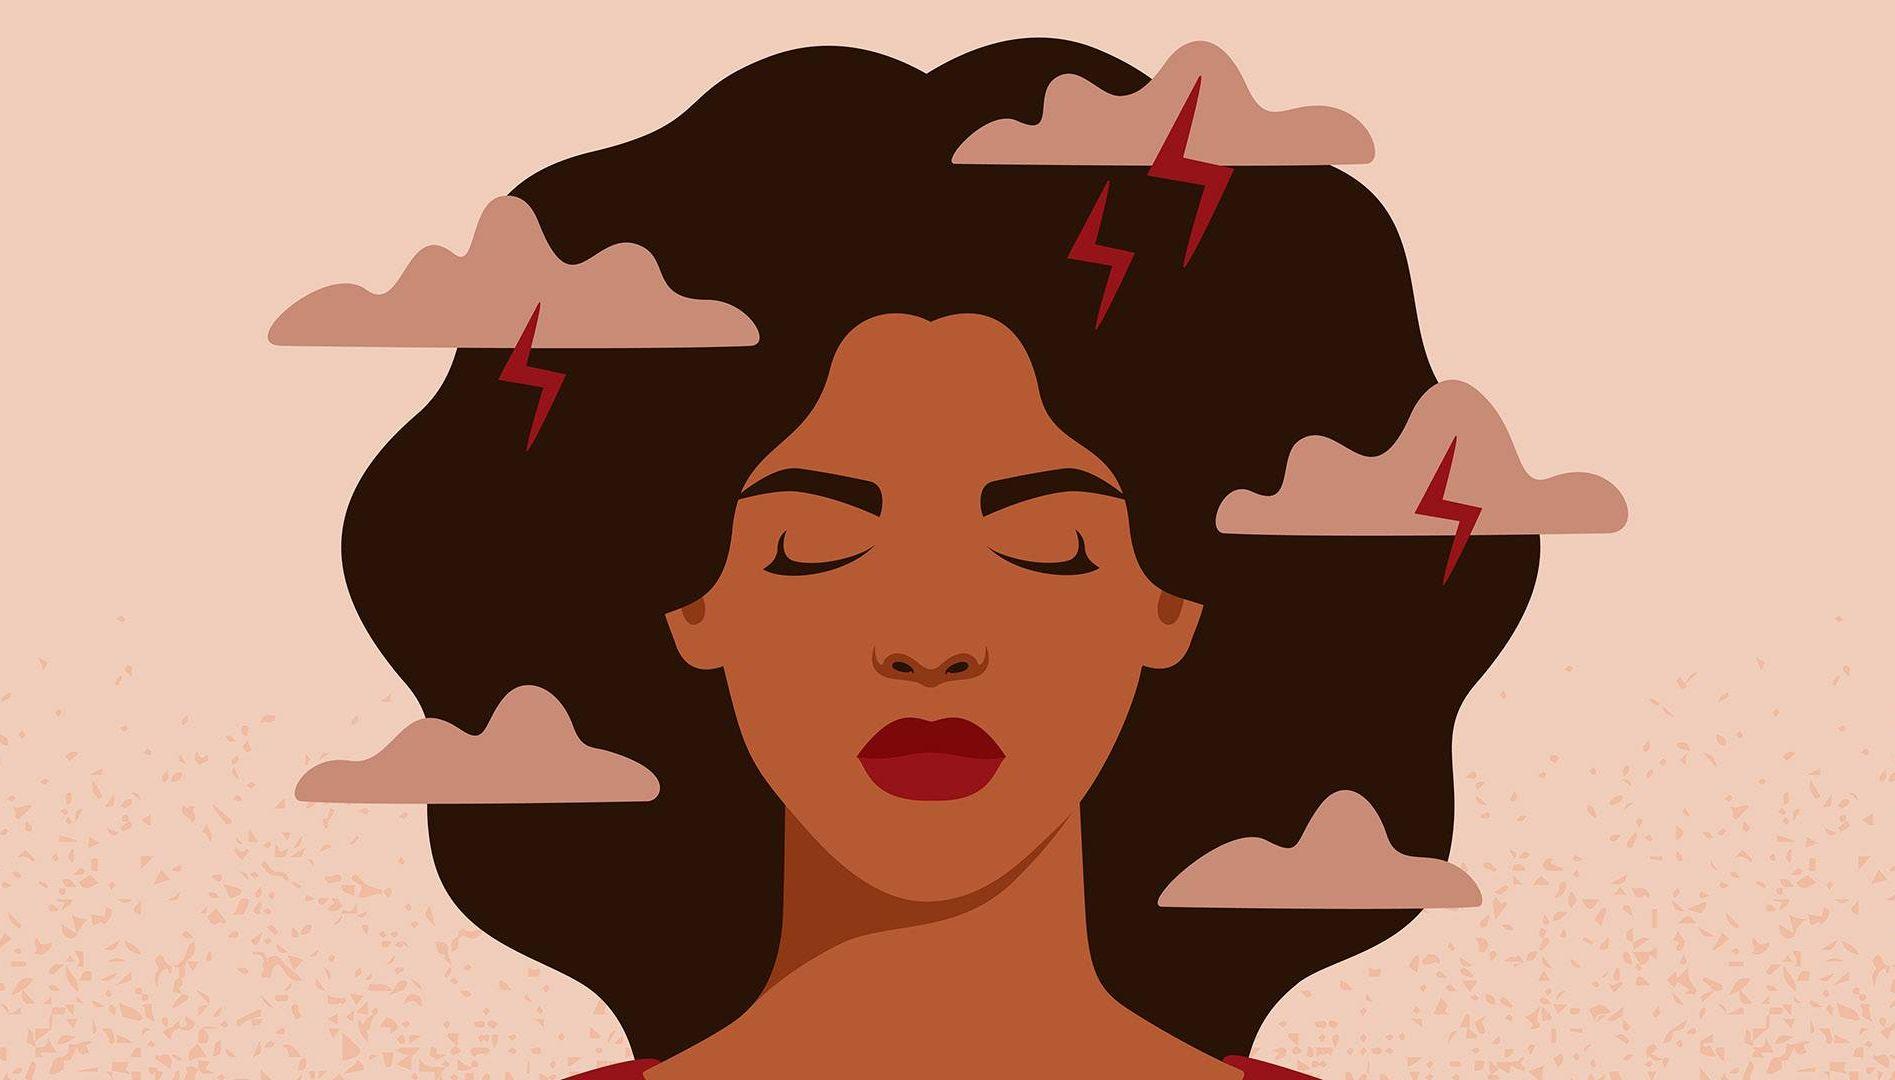 woman mental health .rewire pbs health chronic illness eating disorder